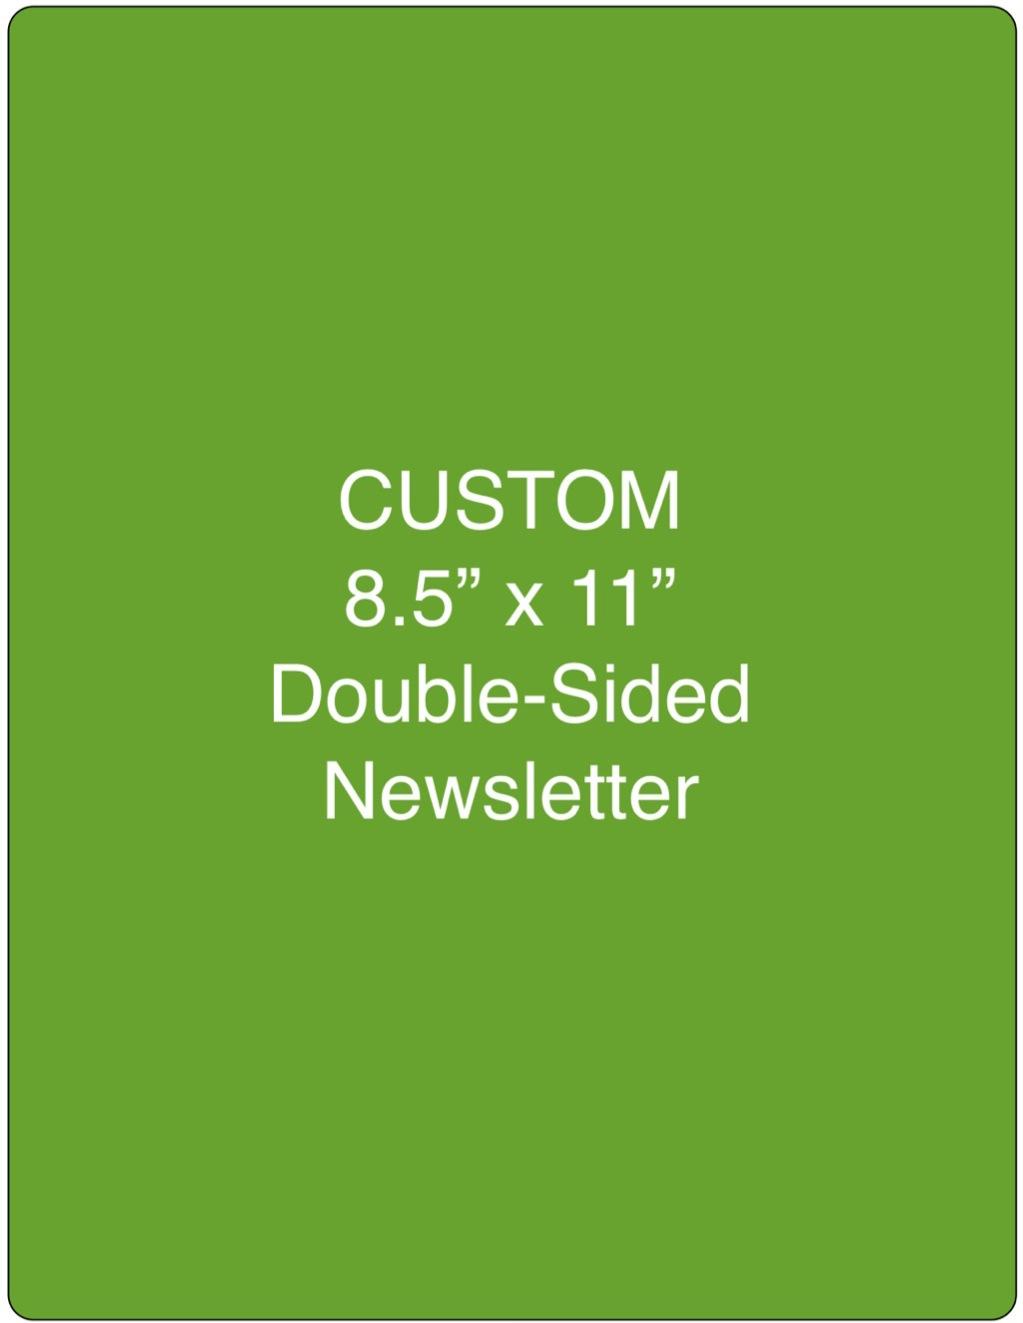 Corefact Custom Newsletter 8.5x11 (Portrait)